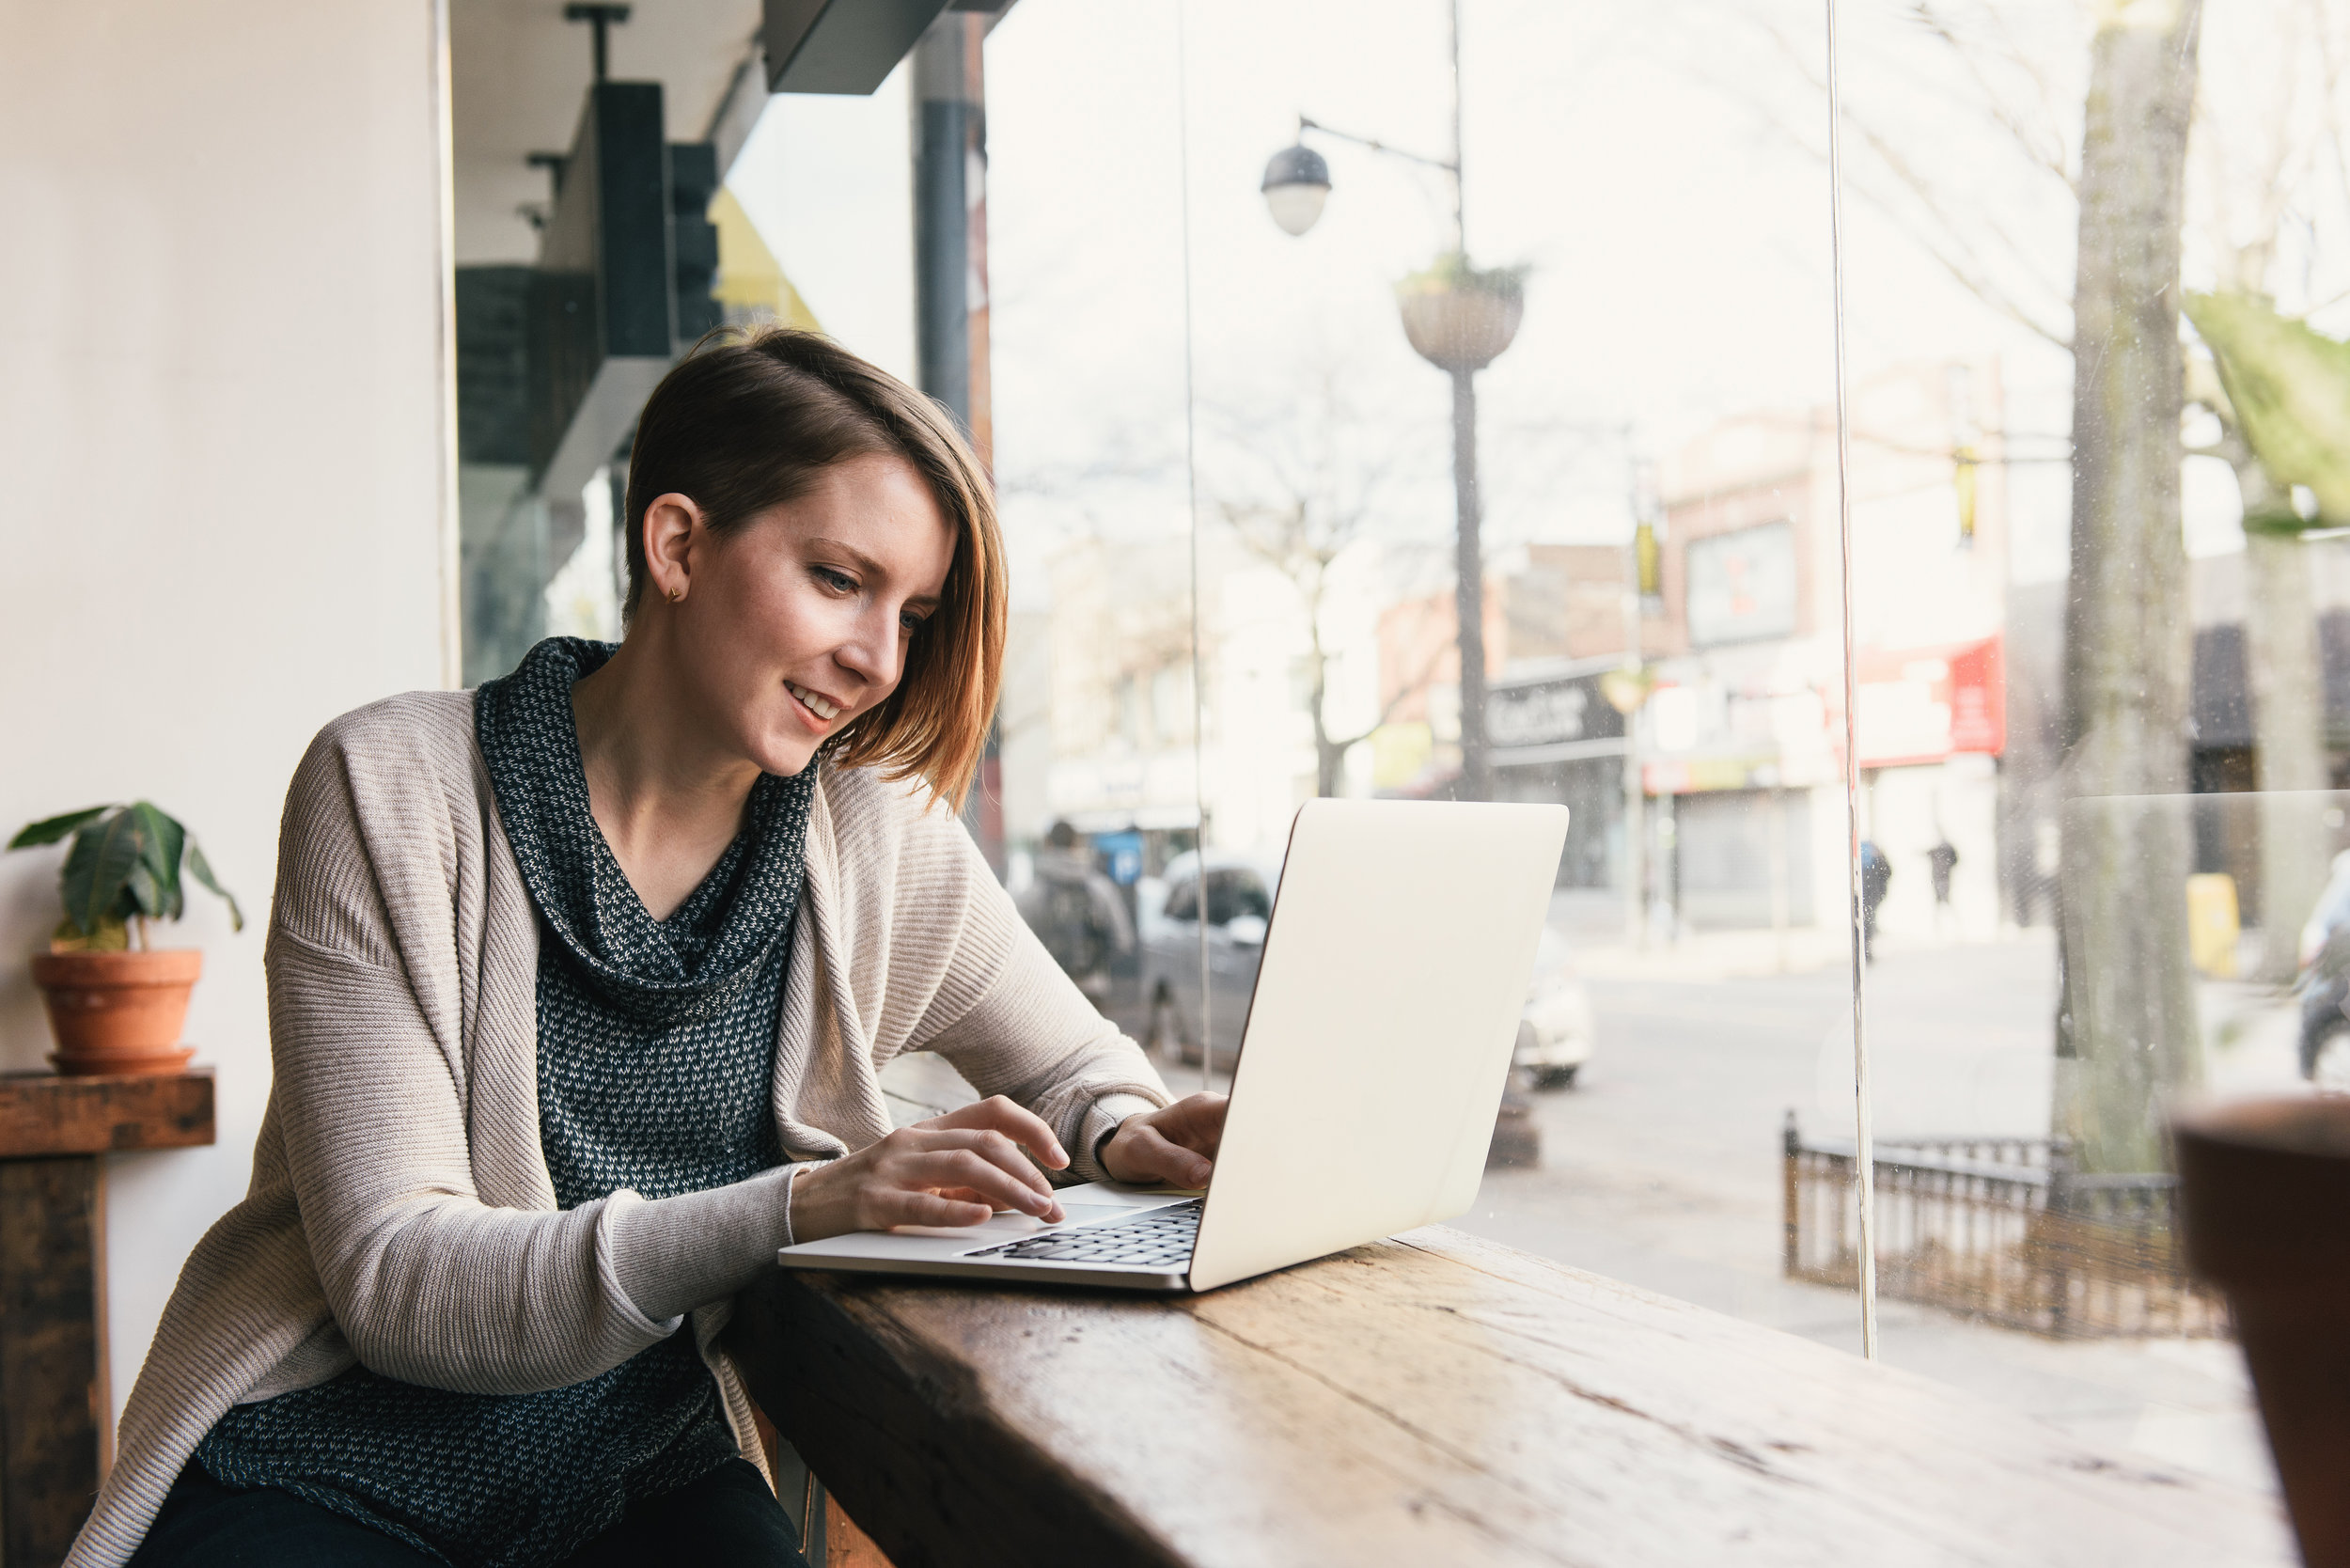 Seller_Seller Center_Female customer sitting in coffee shop window seat typing on laptop.jpg